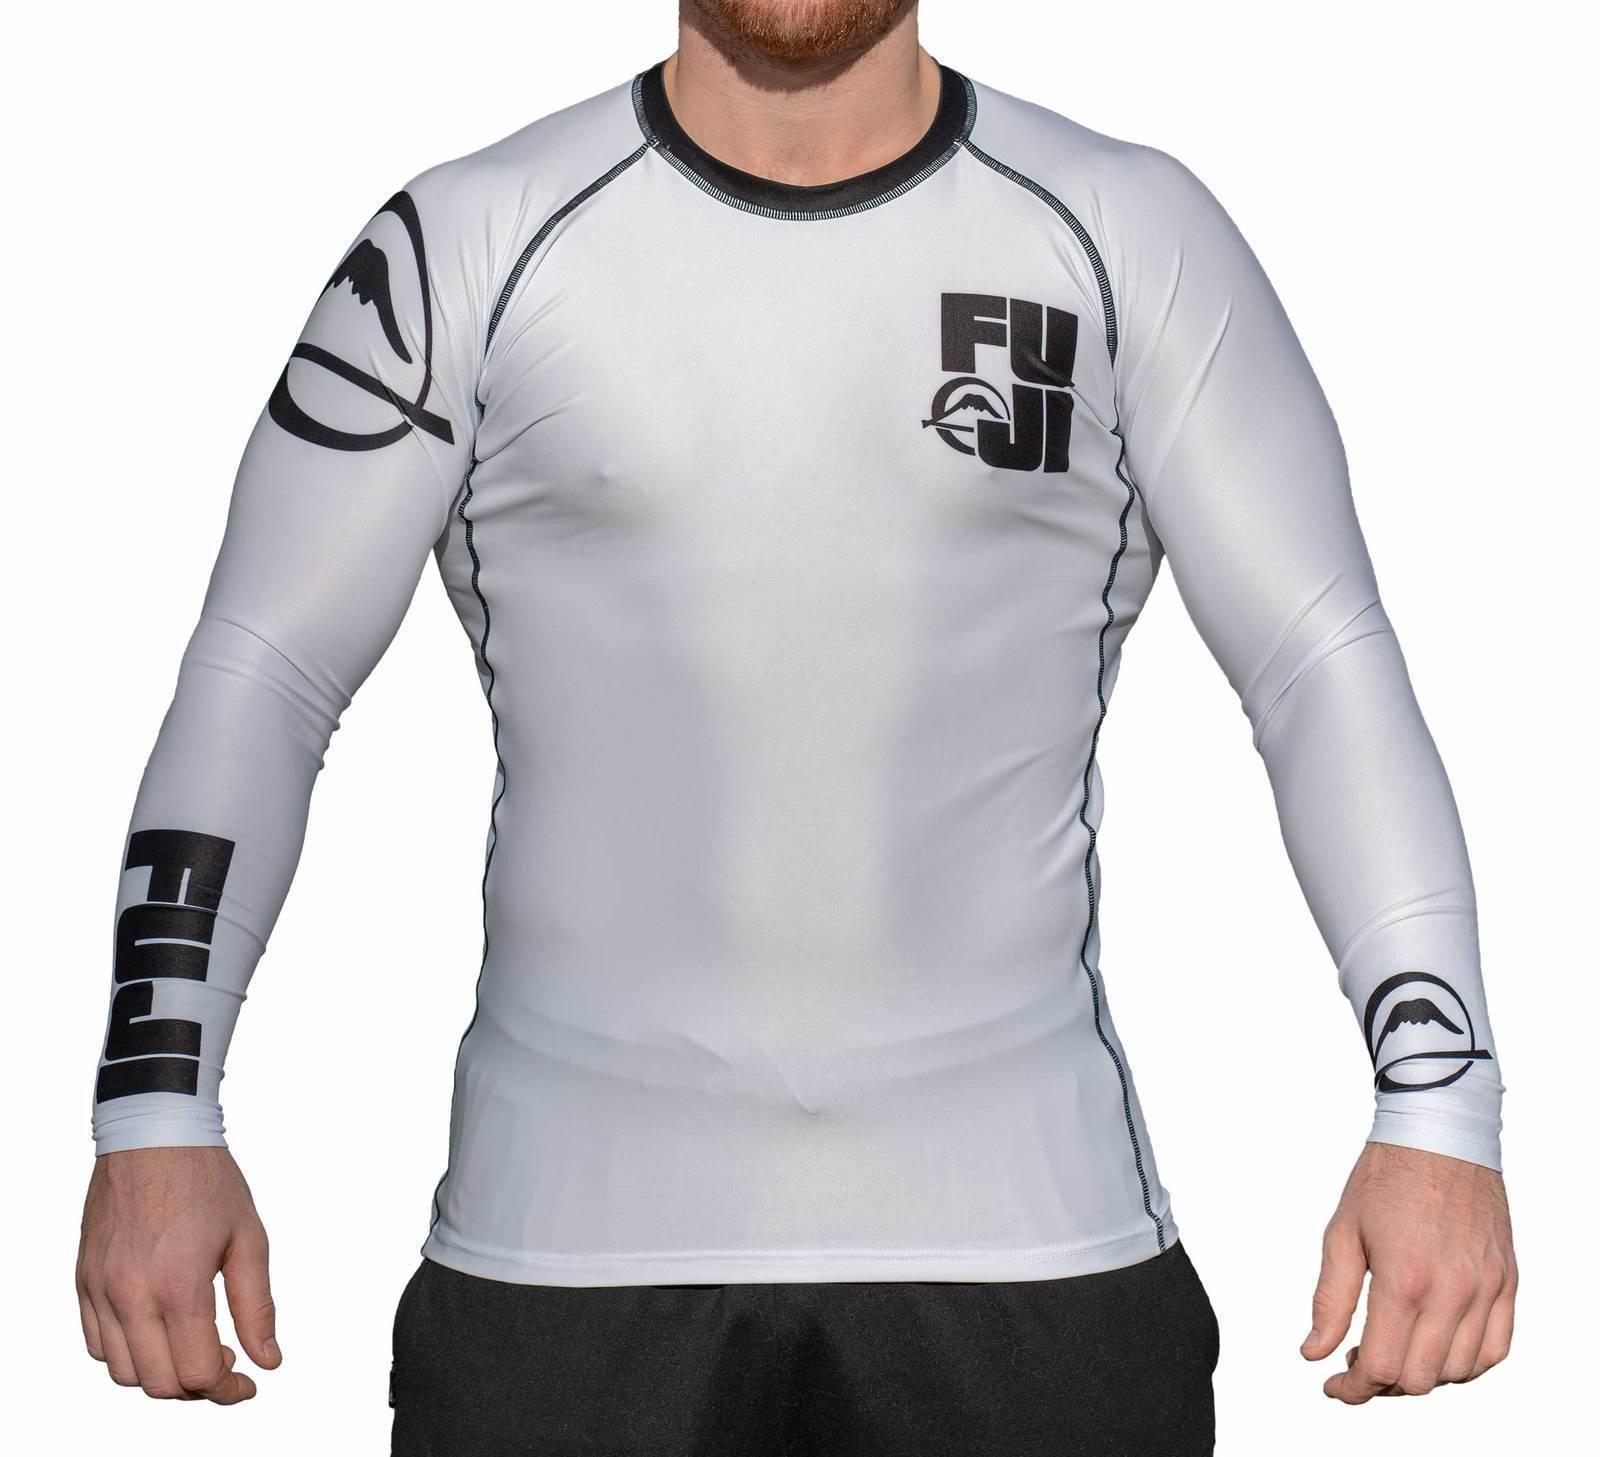 New Big Fuji MMA BJJ Jiu Jitsu LongSleeve Long Sleeve LS Rashguard Rash - White